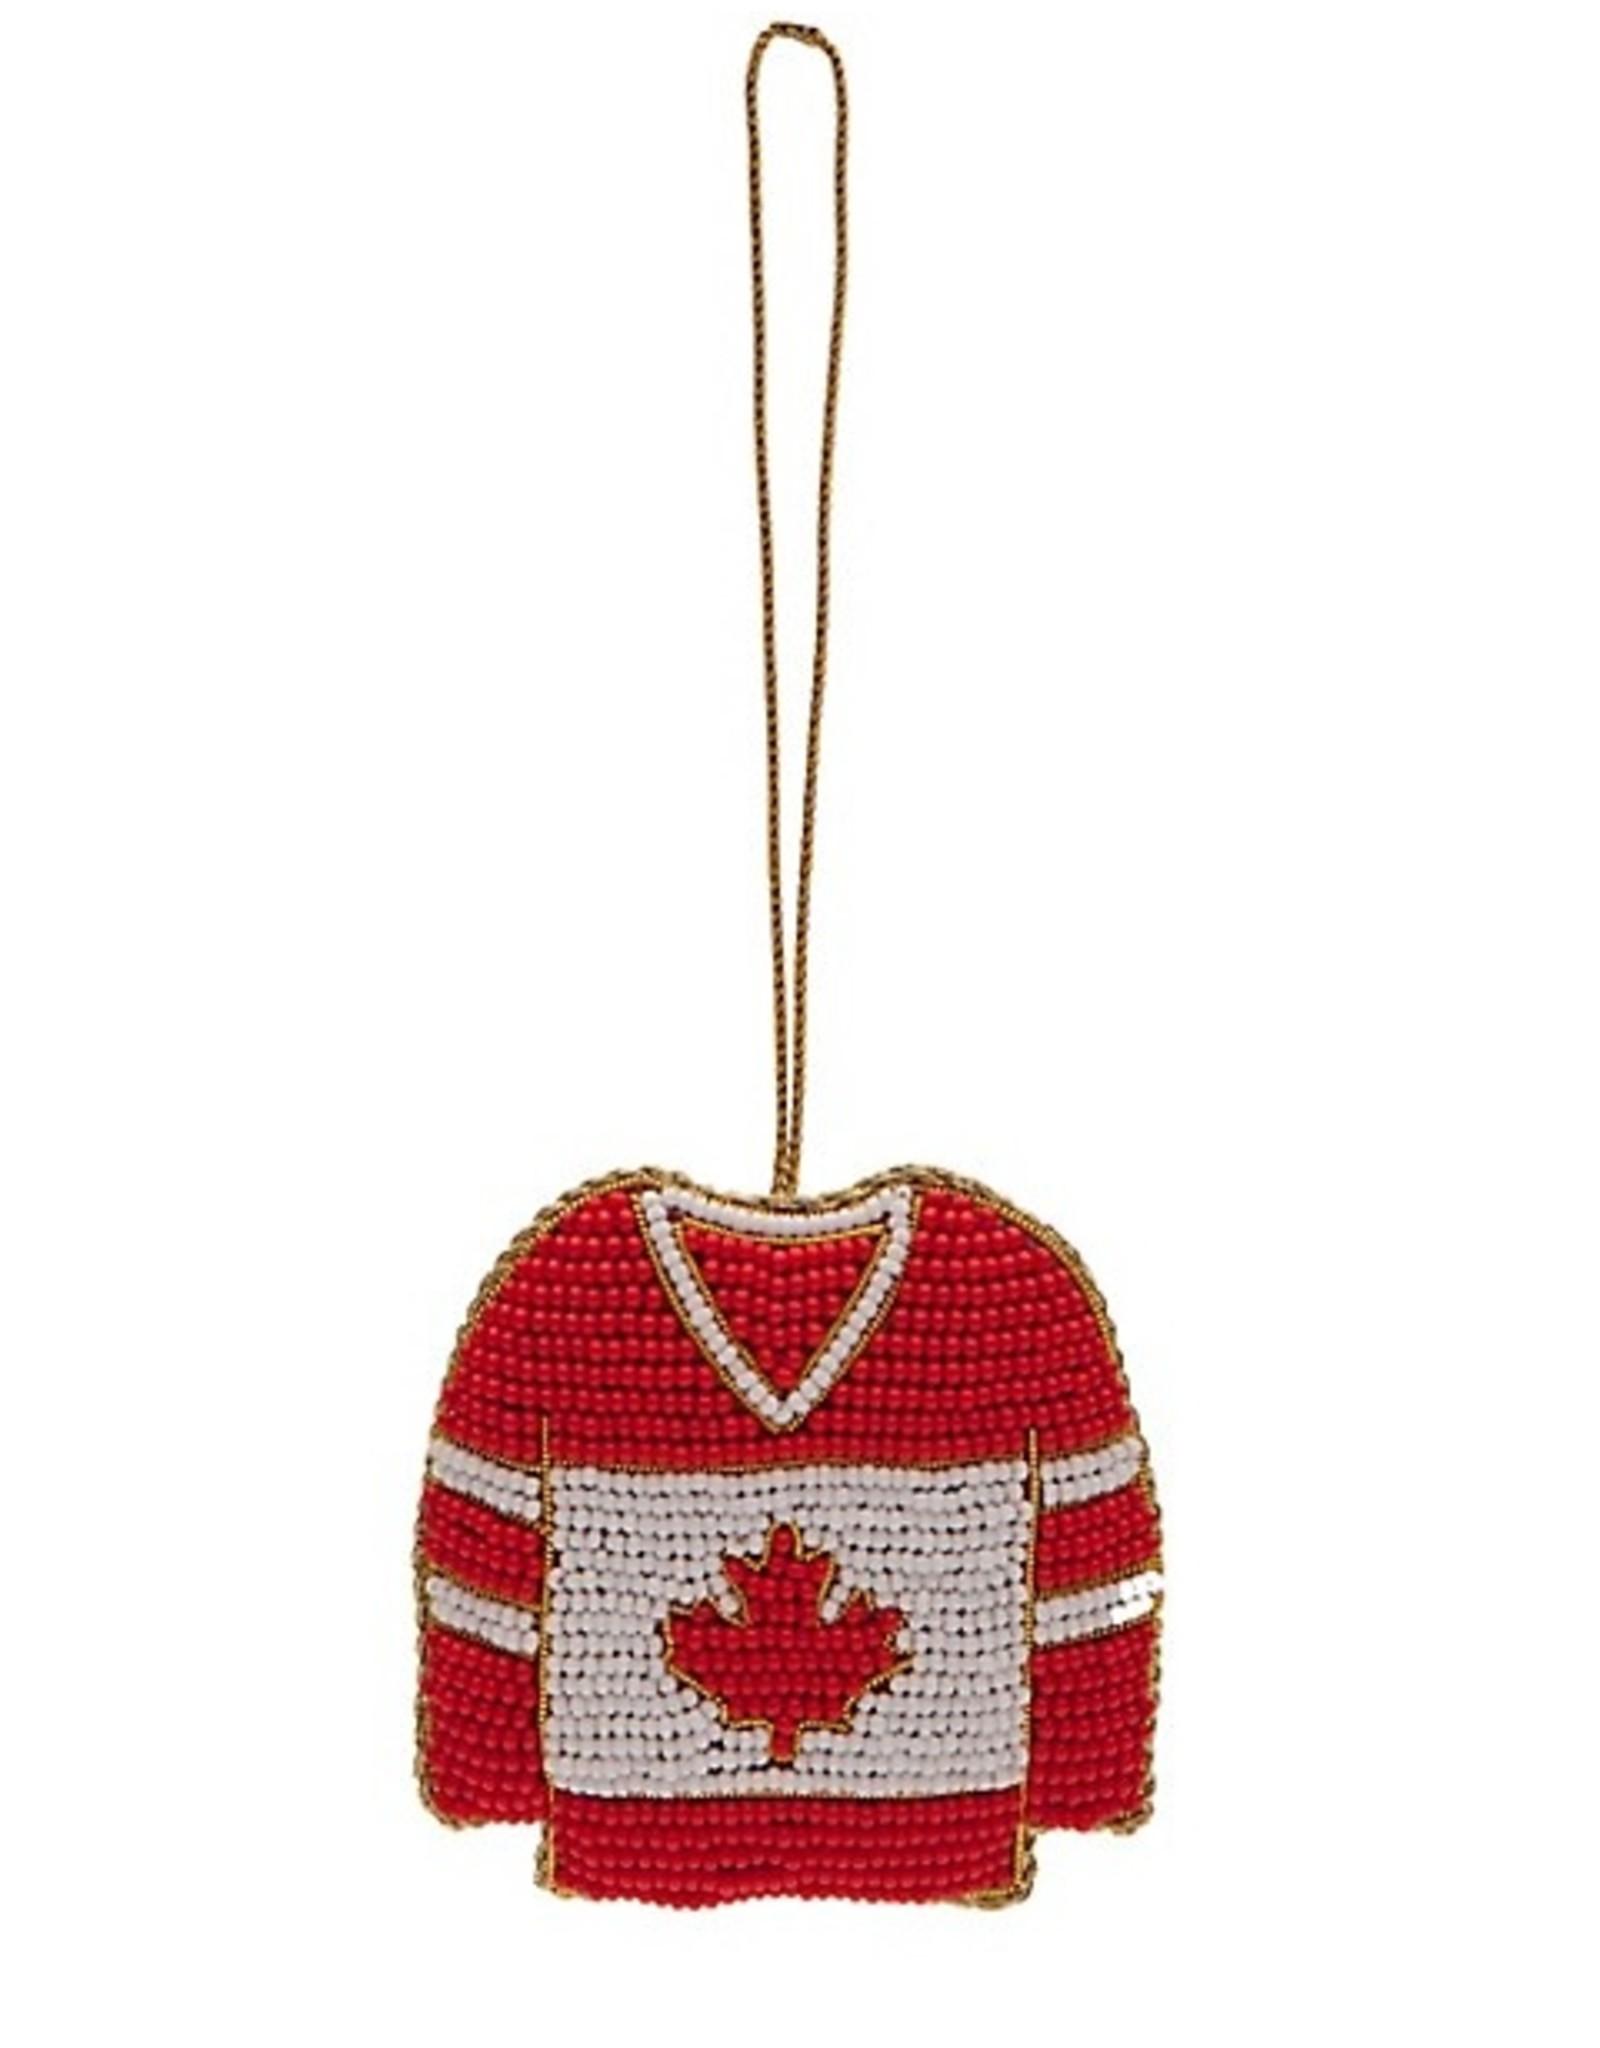 ORNEMENT CHANDAIL CANADA